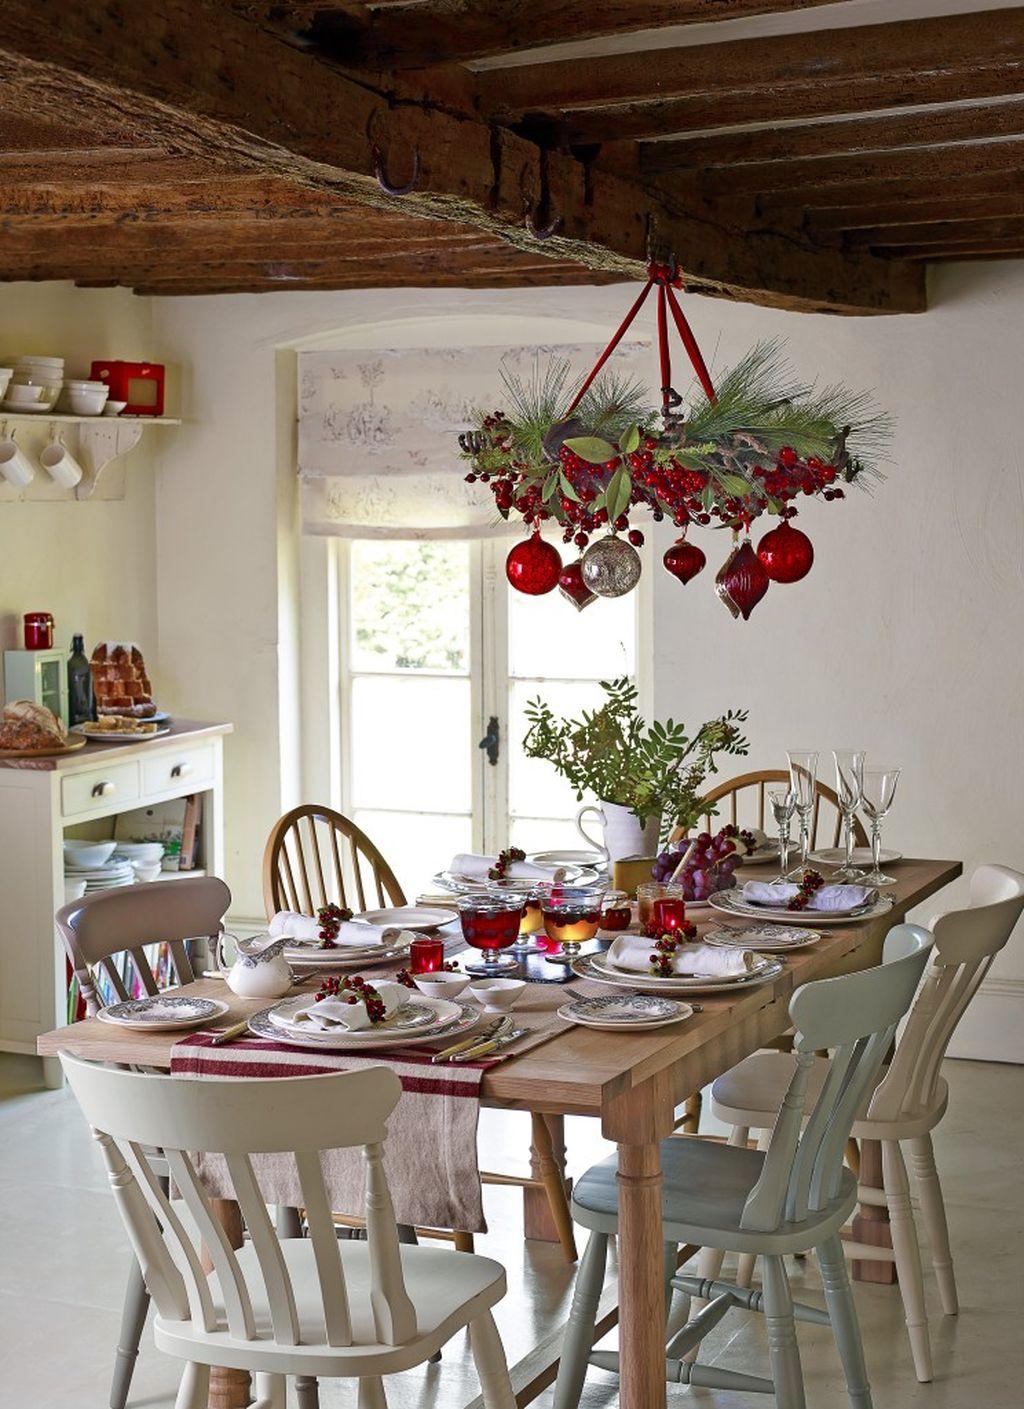 Adorable Rustic Christmas Kitchen Decoration Ideas 28